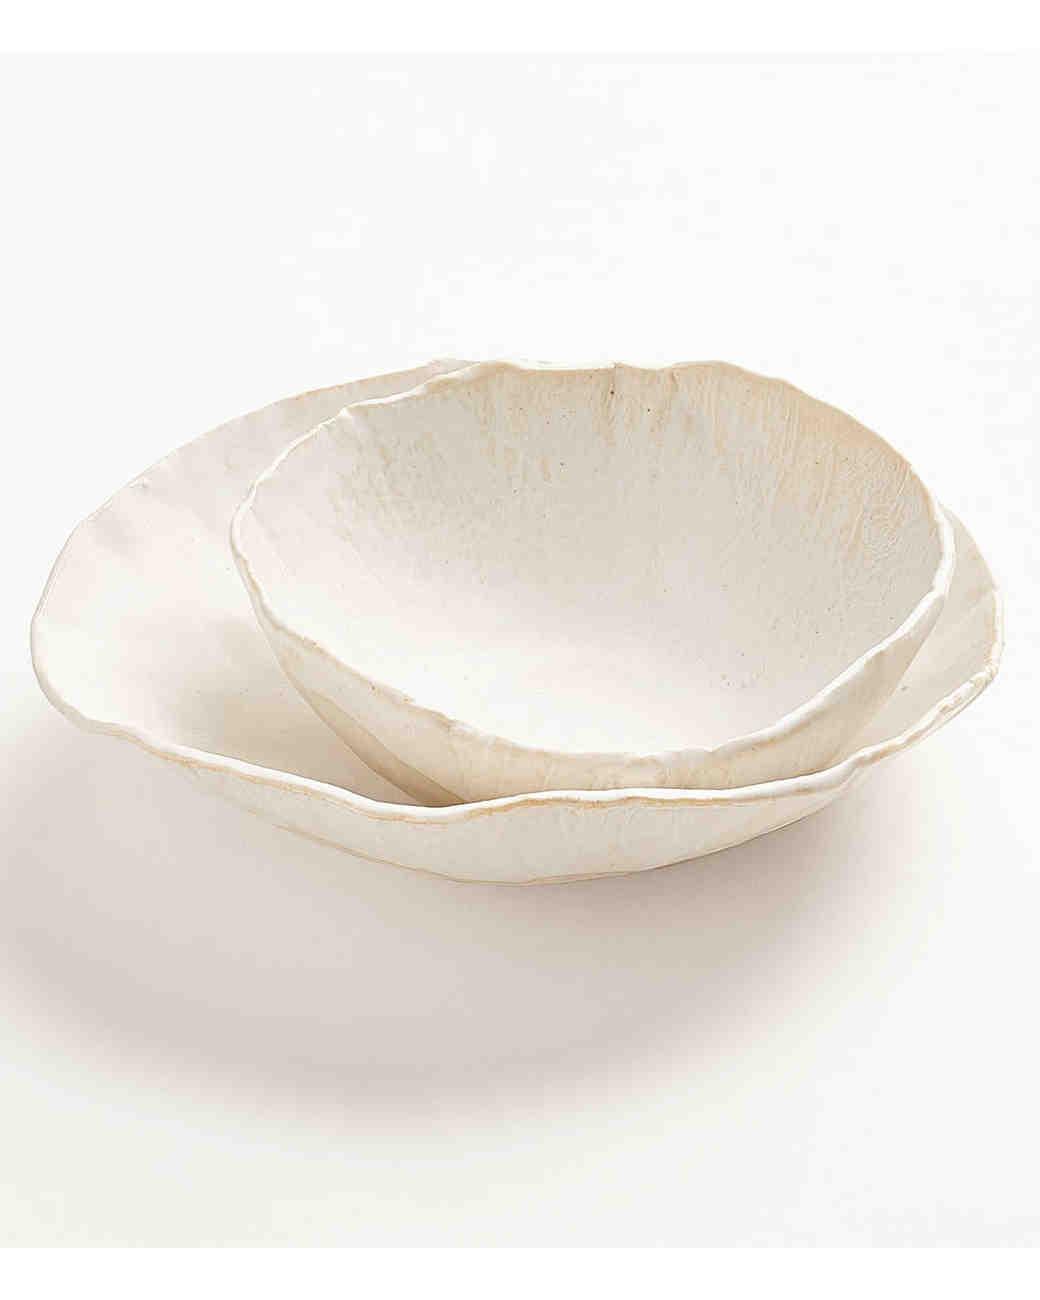 wedding-gifts-abc-home-white-ceramic-bowls-0216.jpg